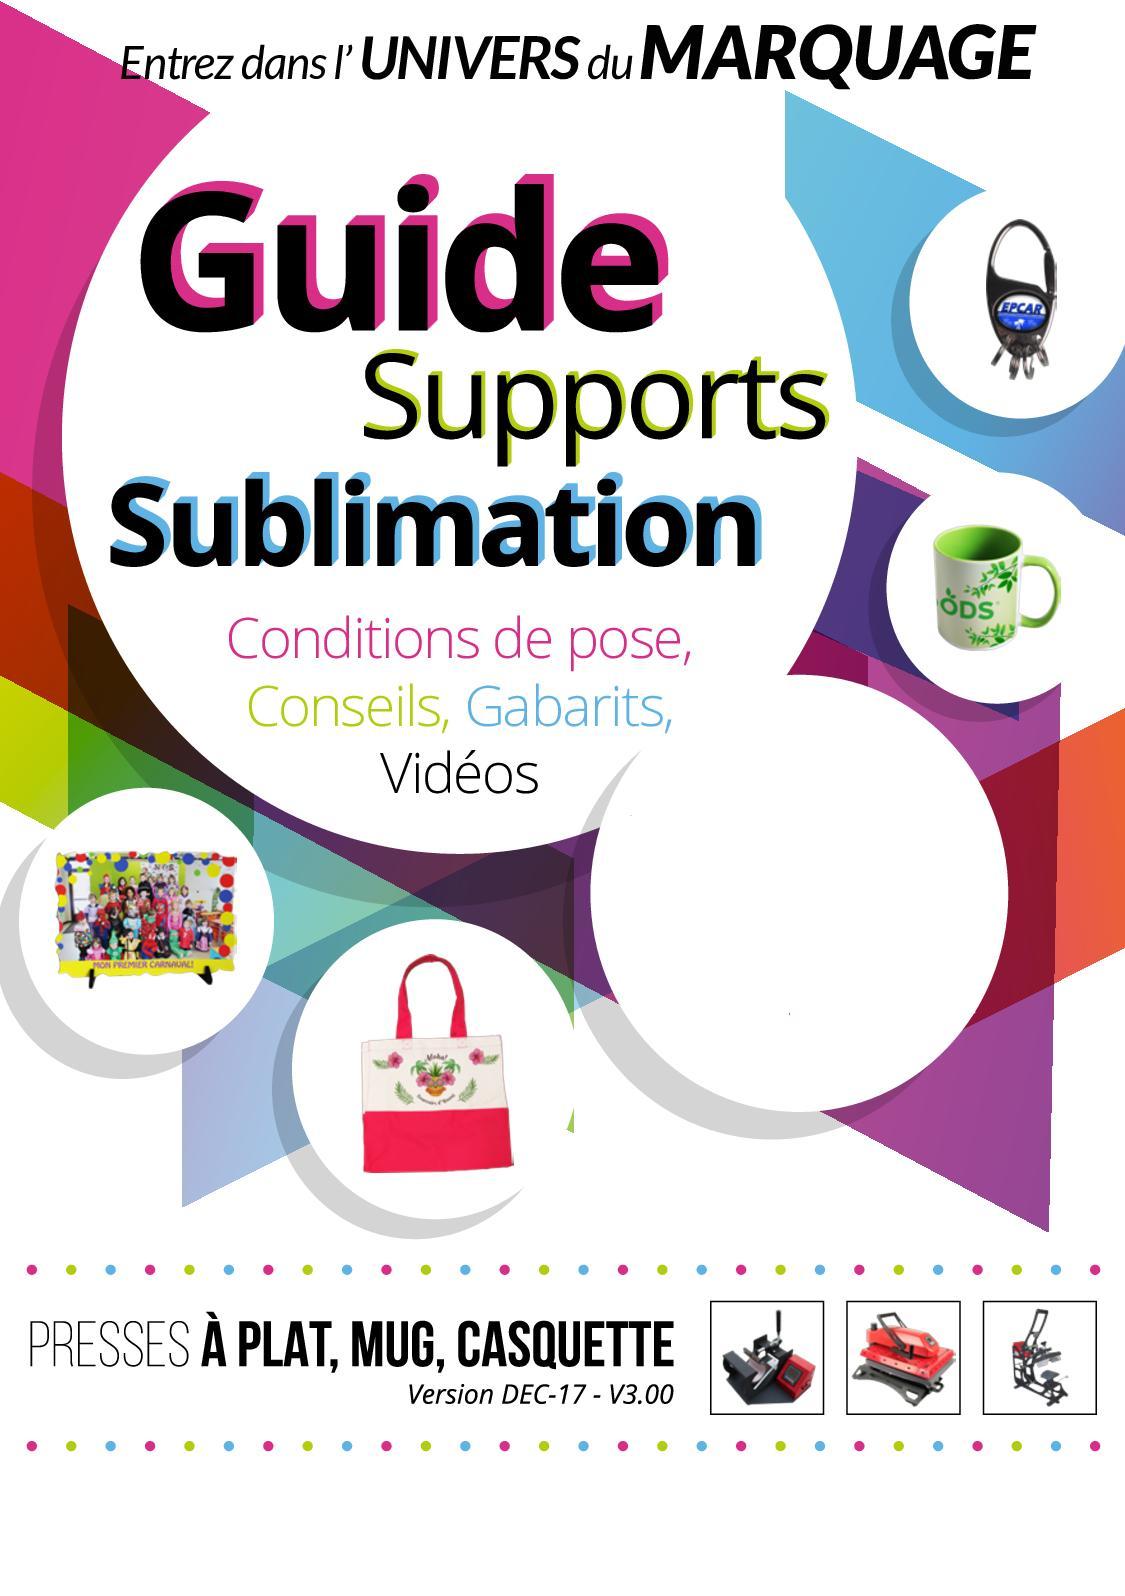 Jan Sublimation Calaméo 18 V1 Guide 00 XuTiOZPk